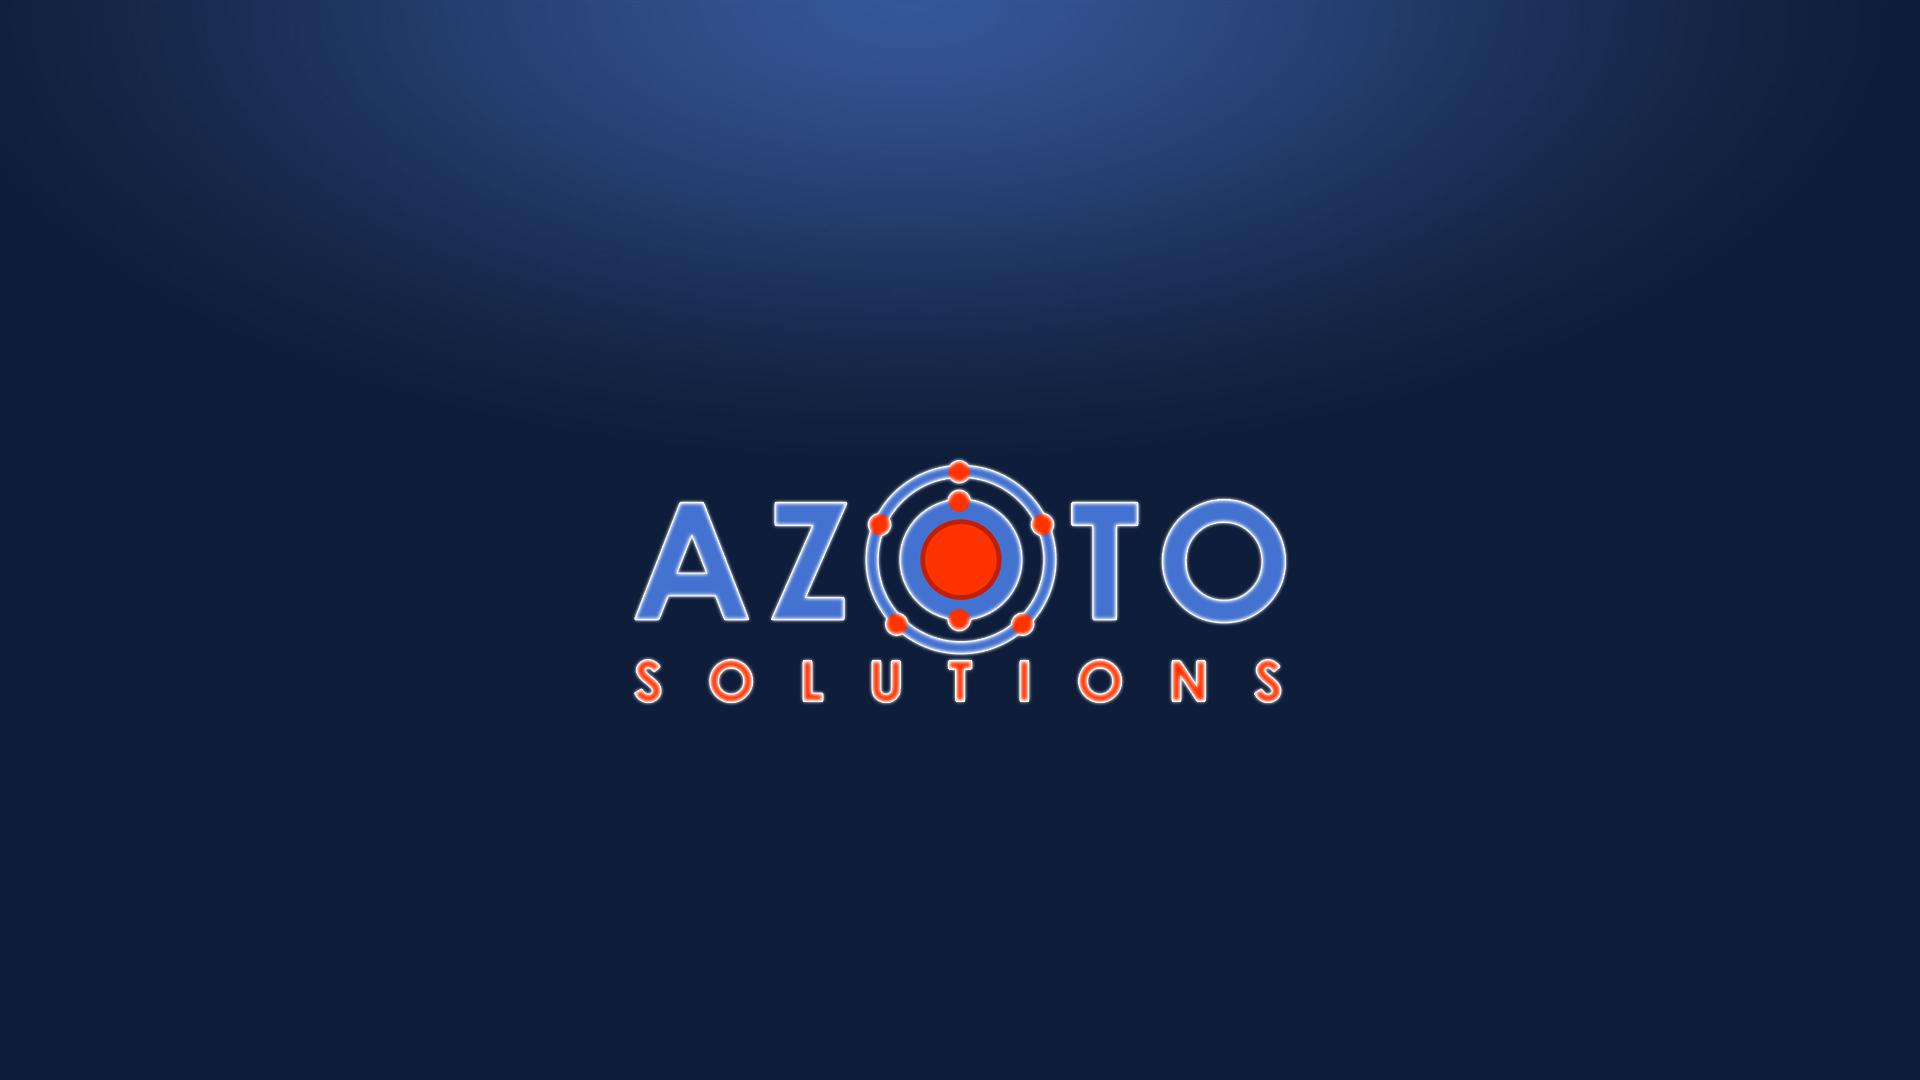 Azotosolutions